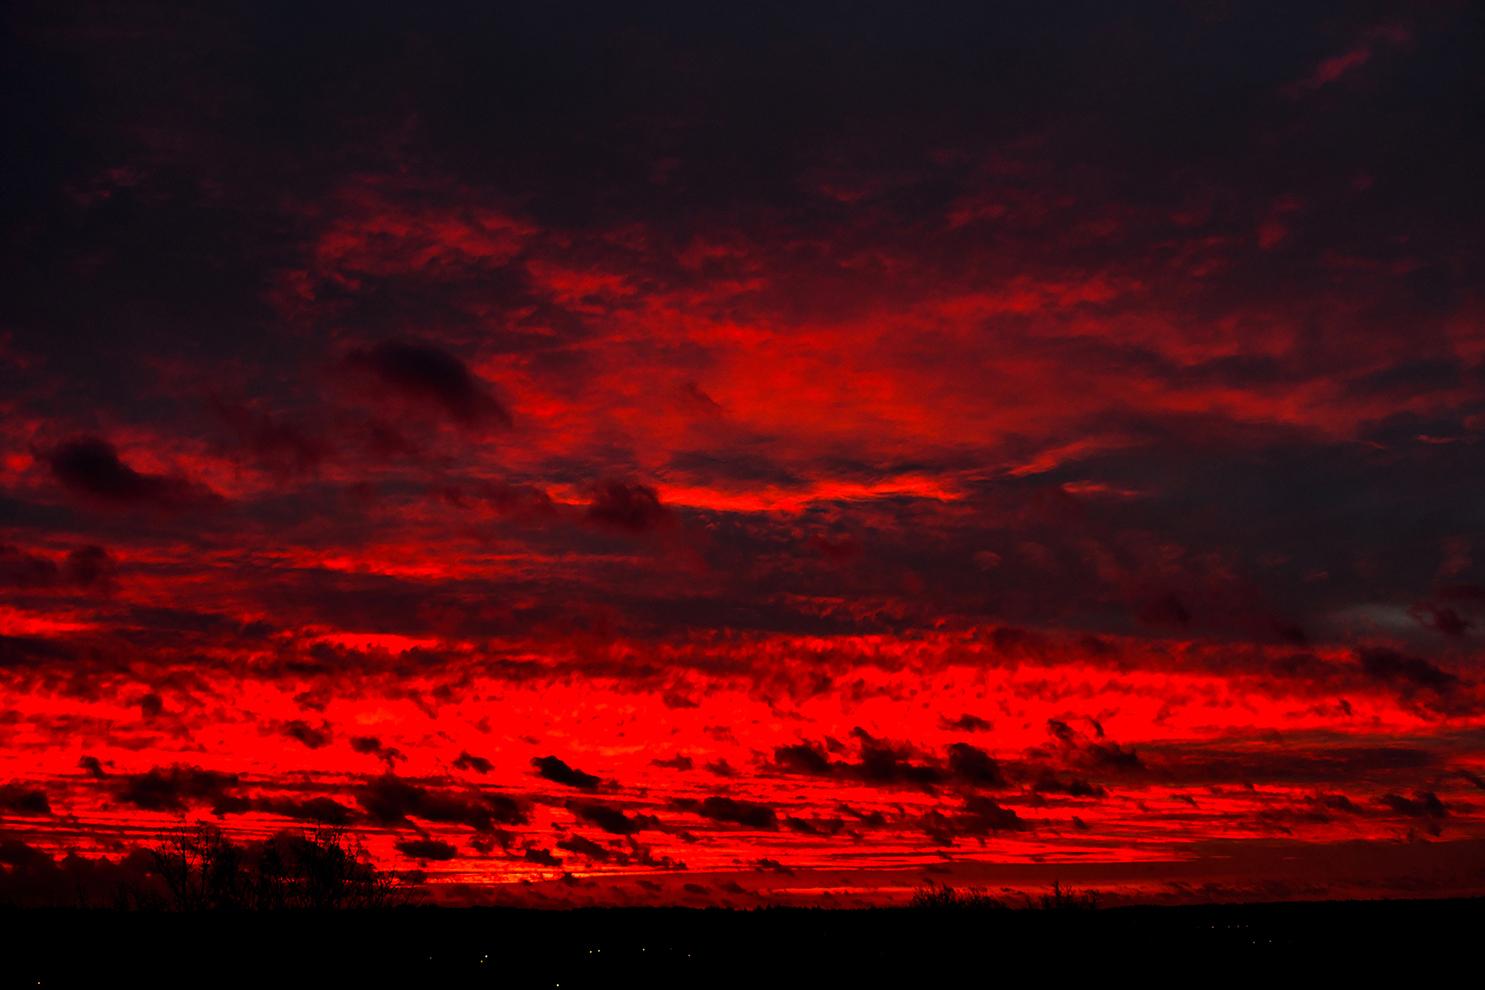 Zondag 9 februari 2020 's morgens om 07.57 uur kleurde de hemel 'vlammend' rood - Foto: ©Louis Fraanje